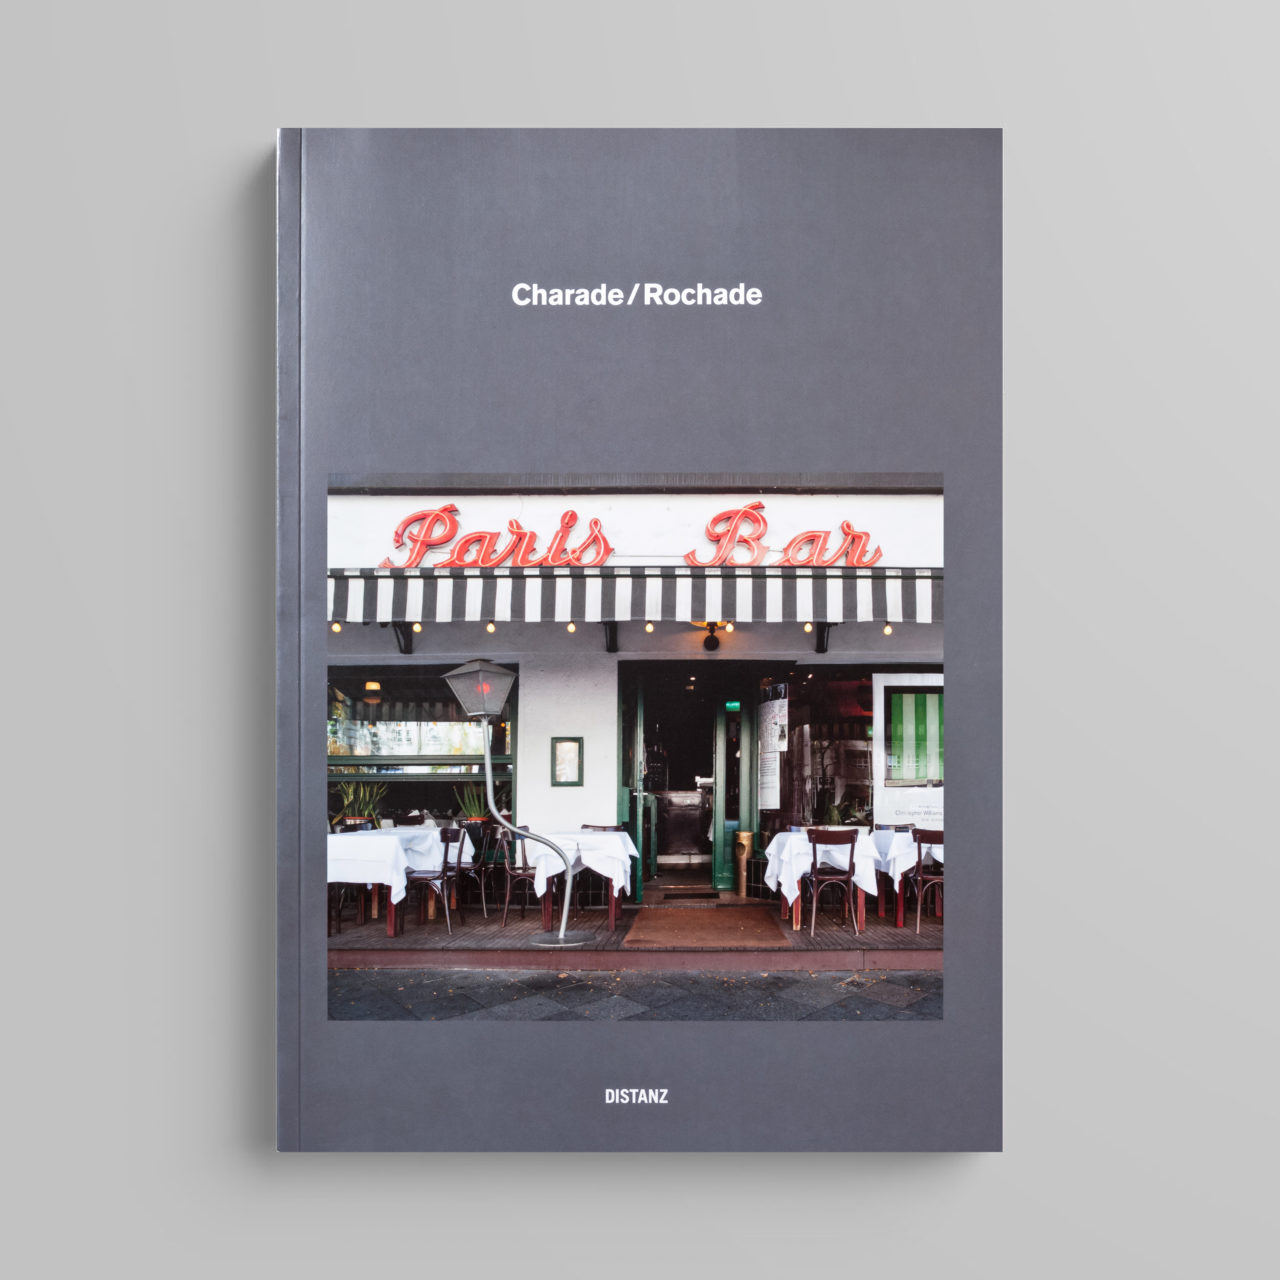 Charade/Rochade, Distanz Verlag, 2013